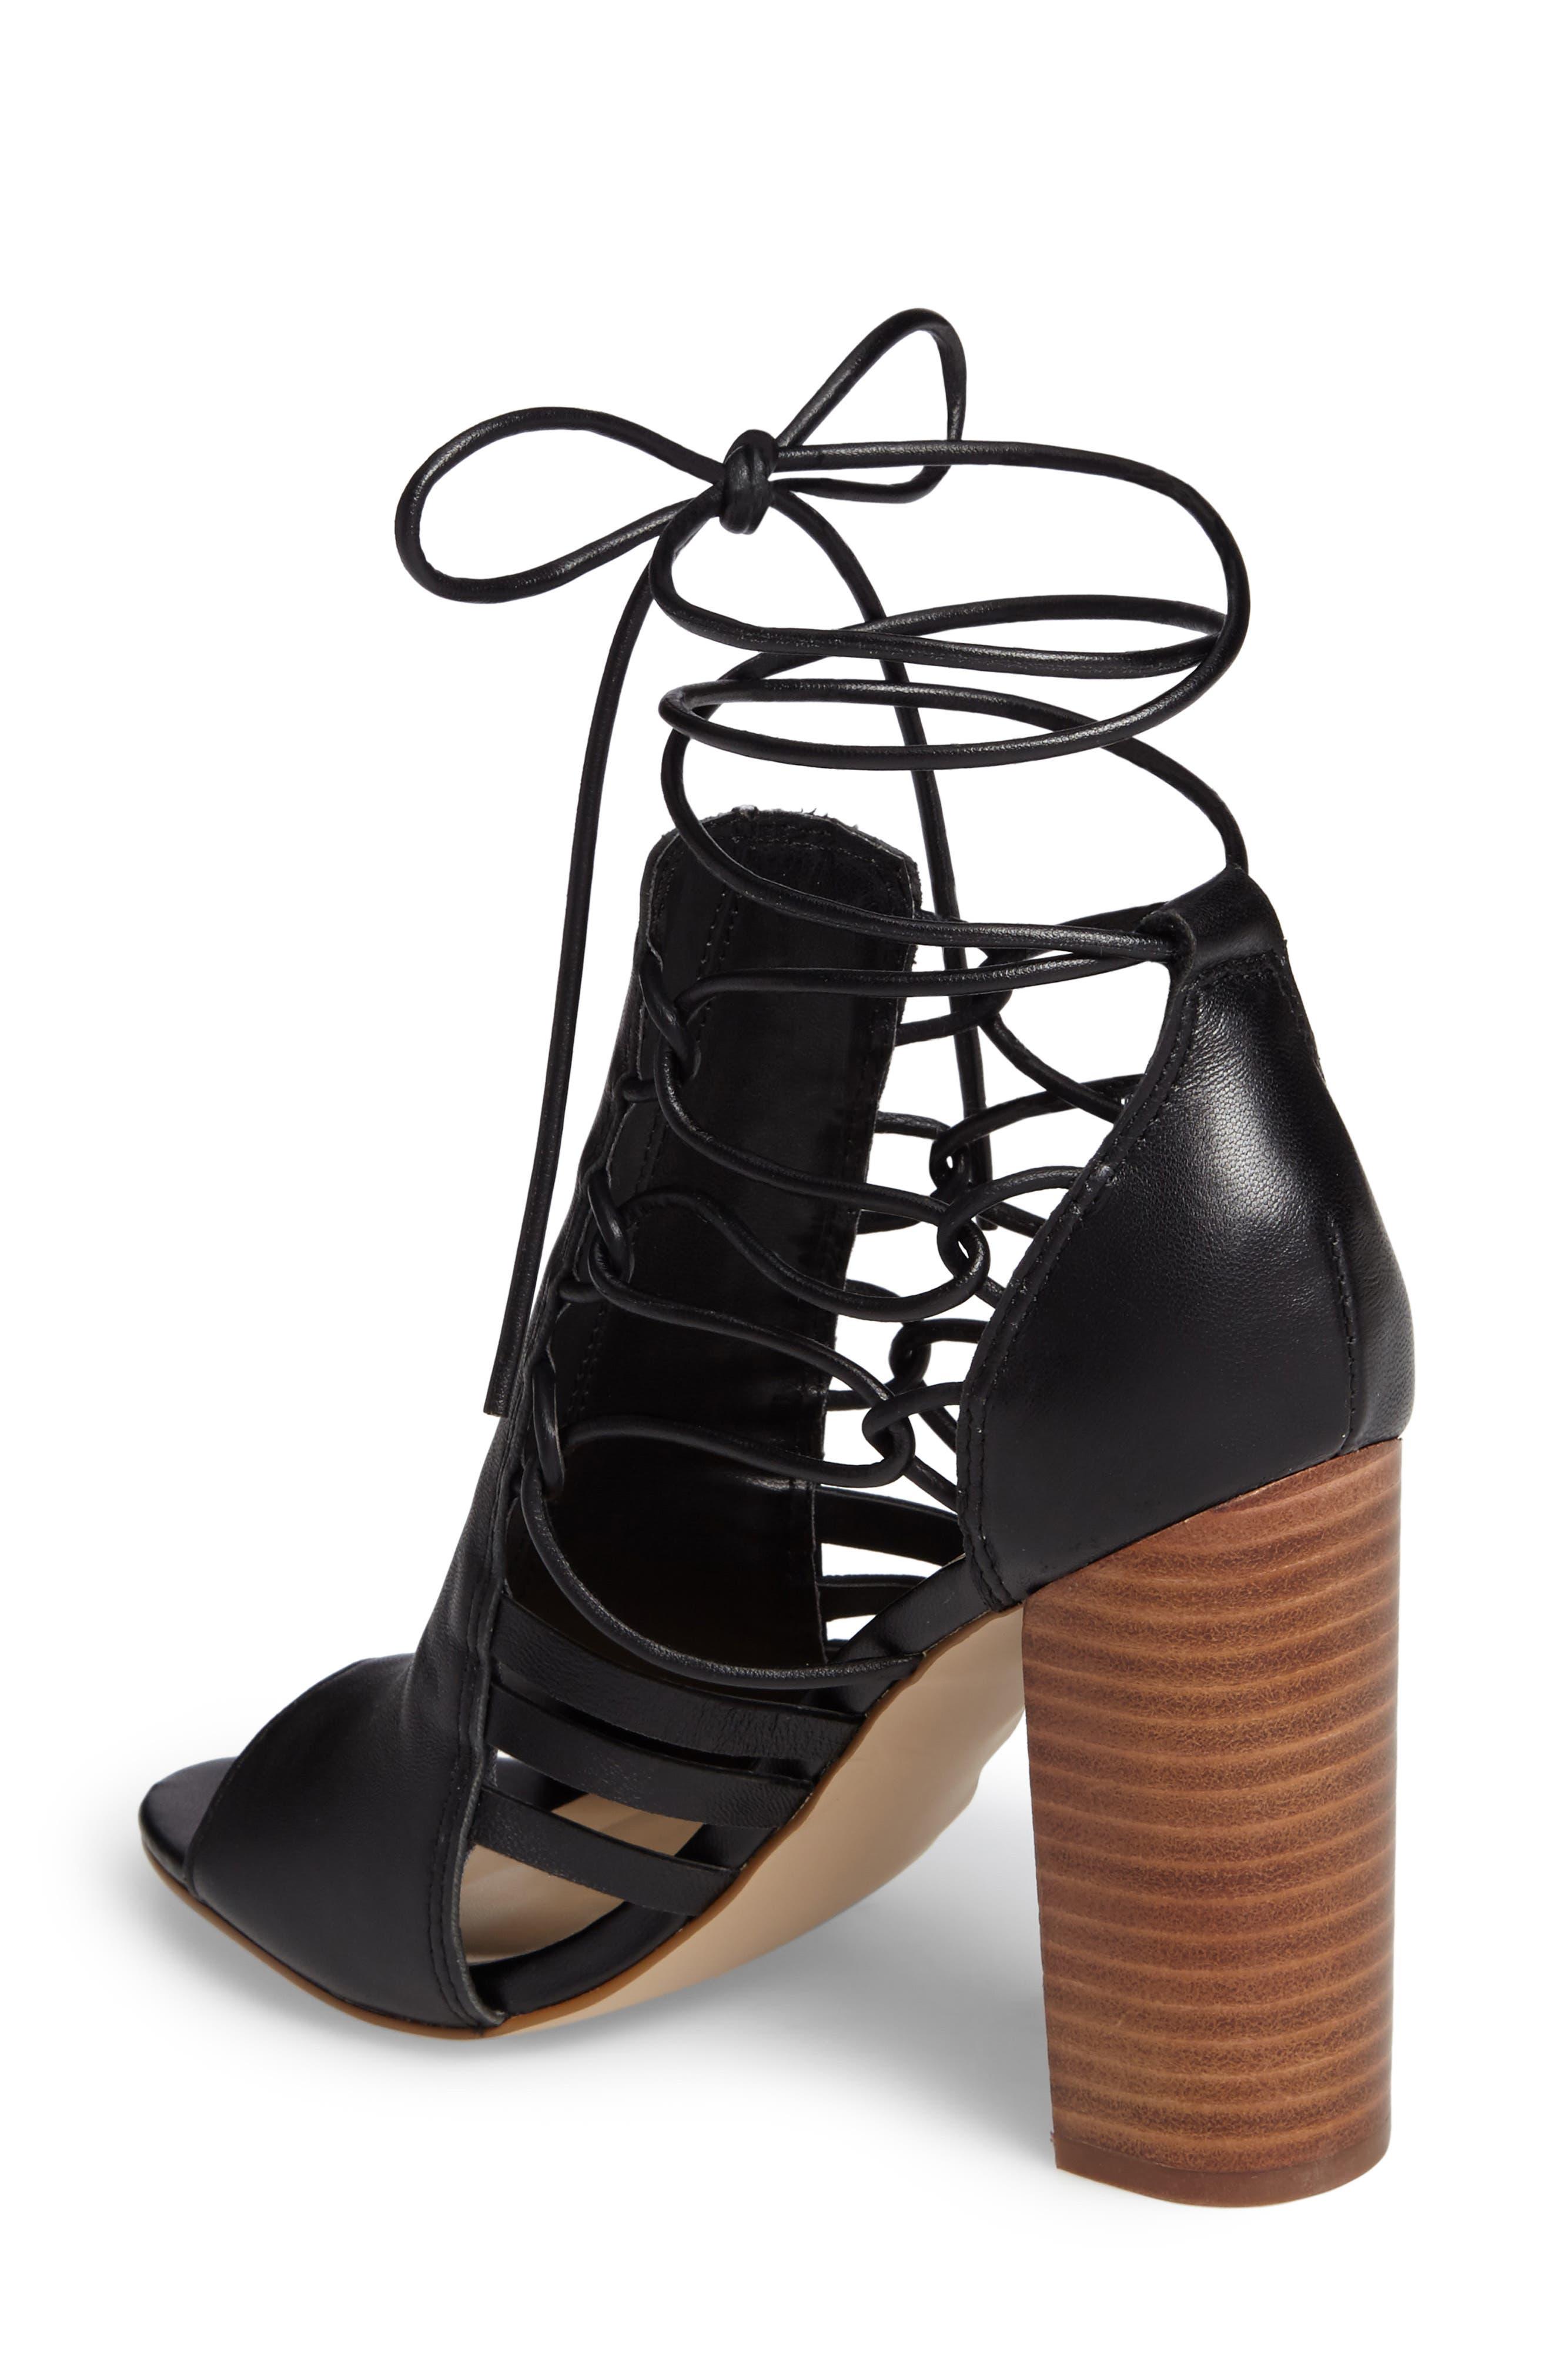 Adette Ankle Tie Sandal,                             Alternate thumbnail 2, color,                             001